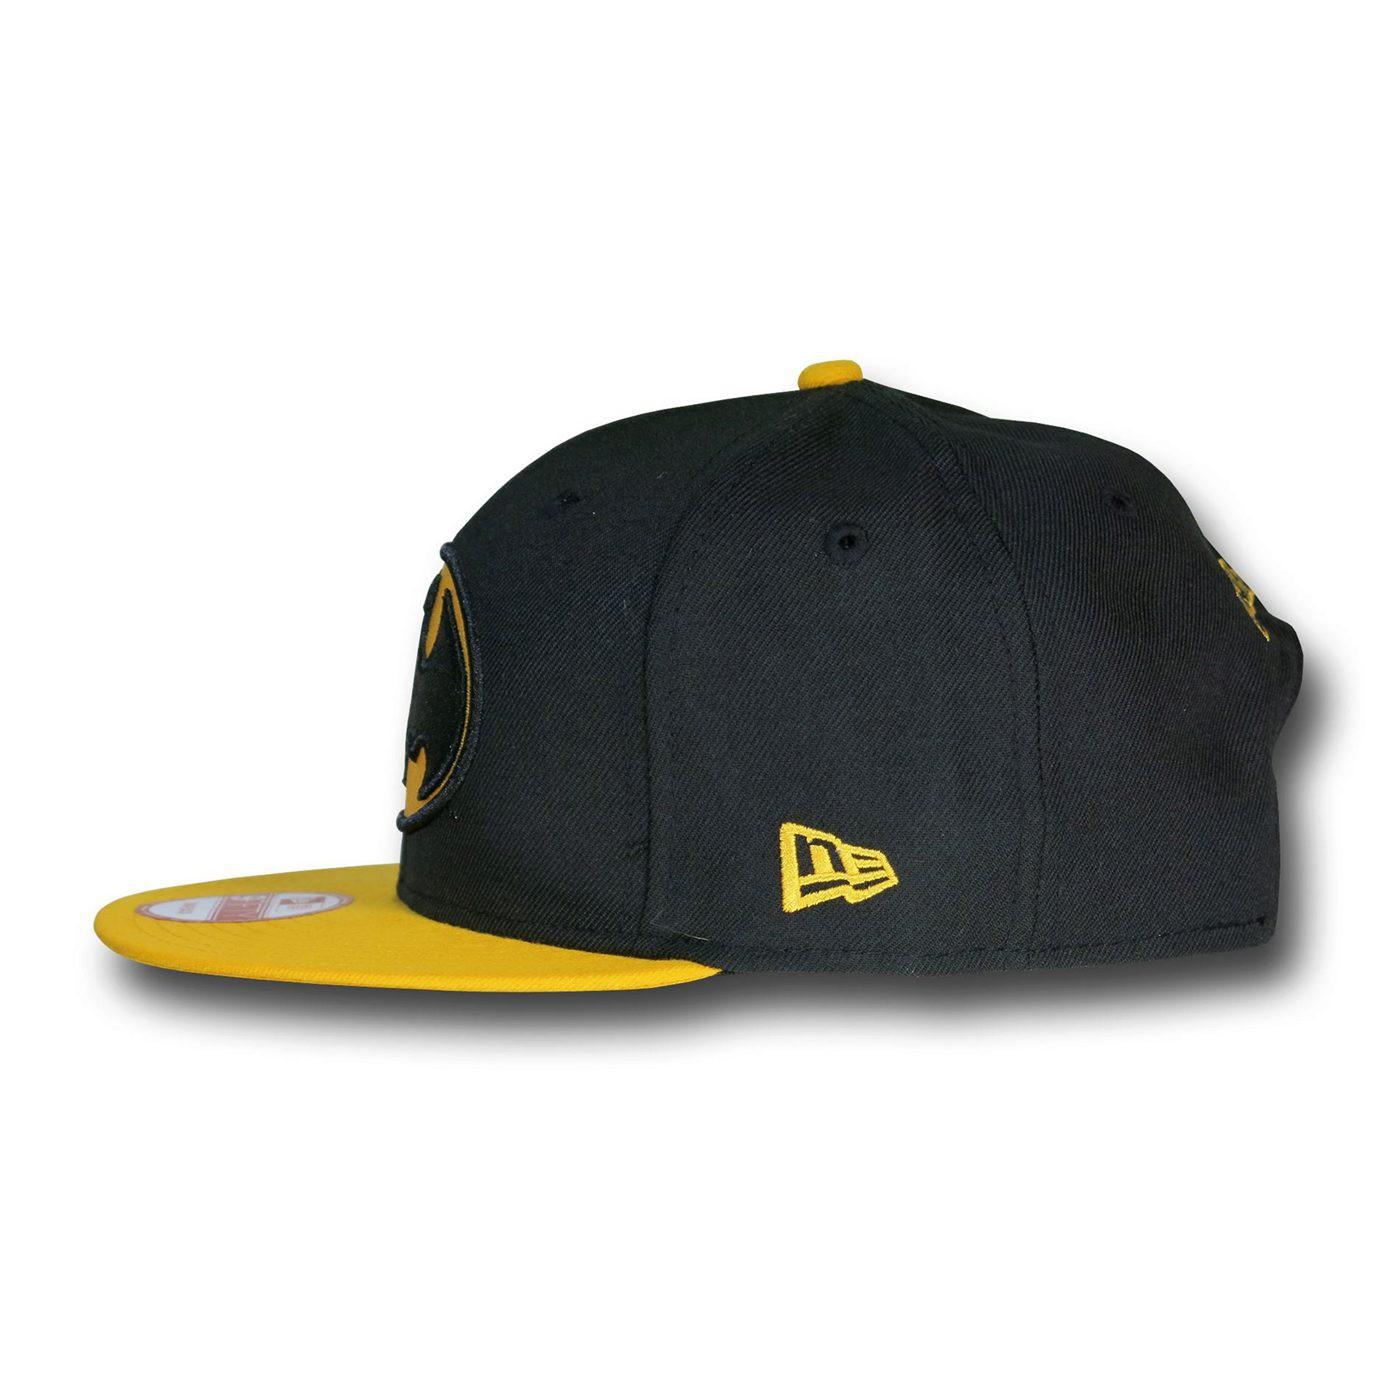 Batman Black & Yellow 9Fifty Snapback Hat